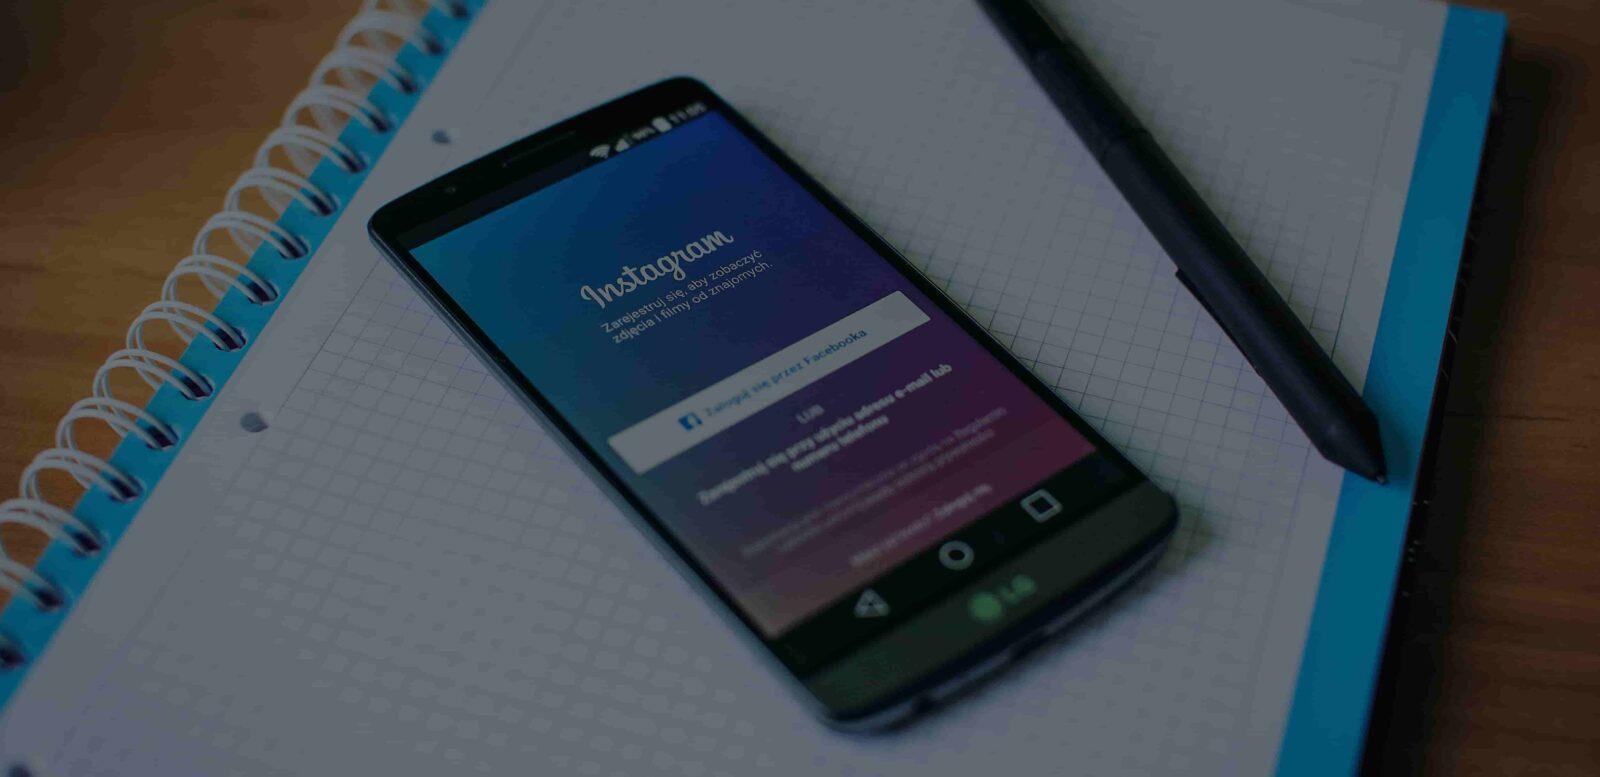 реклама через инстаграм, таргетированная реклама в инстаграм, примеры рекламы в инстаграм